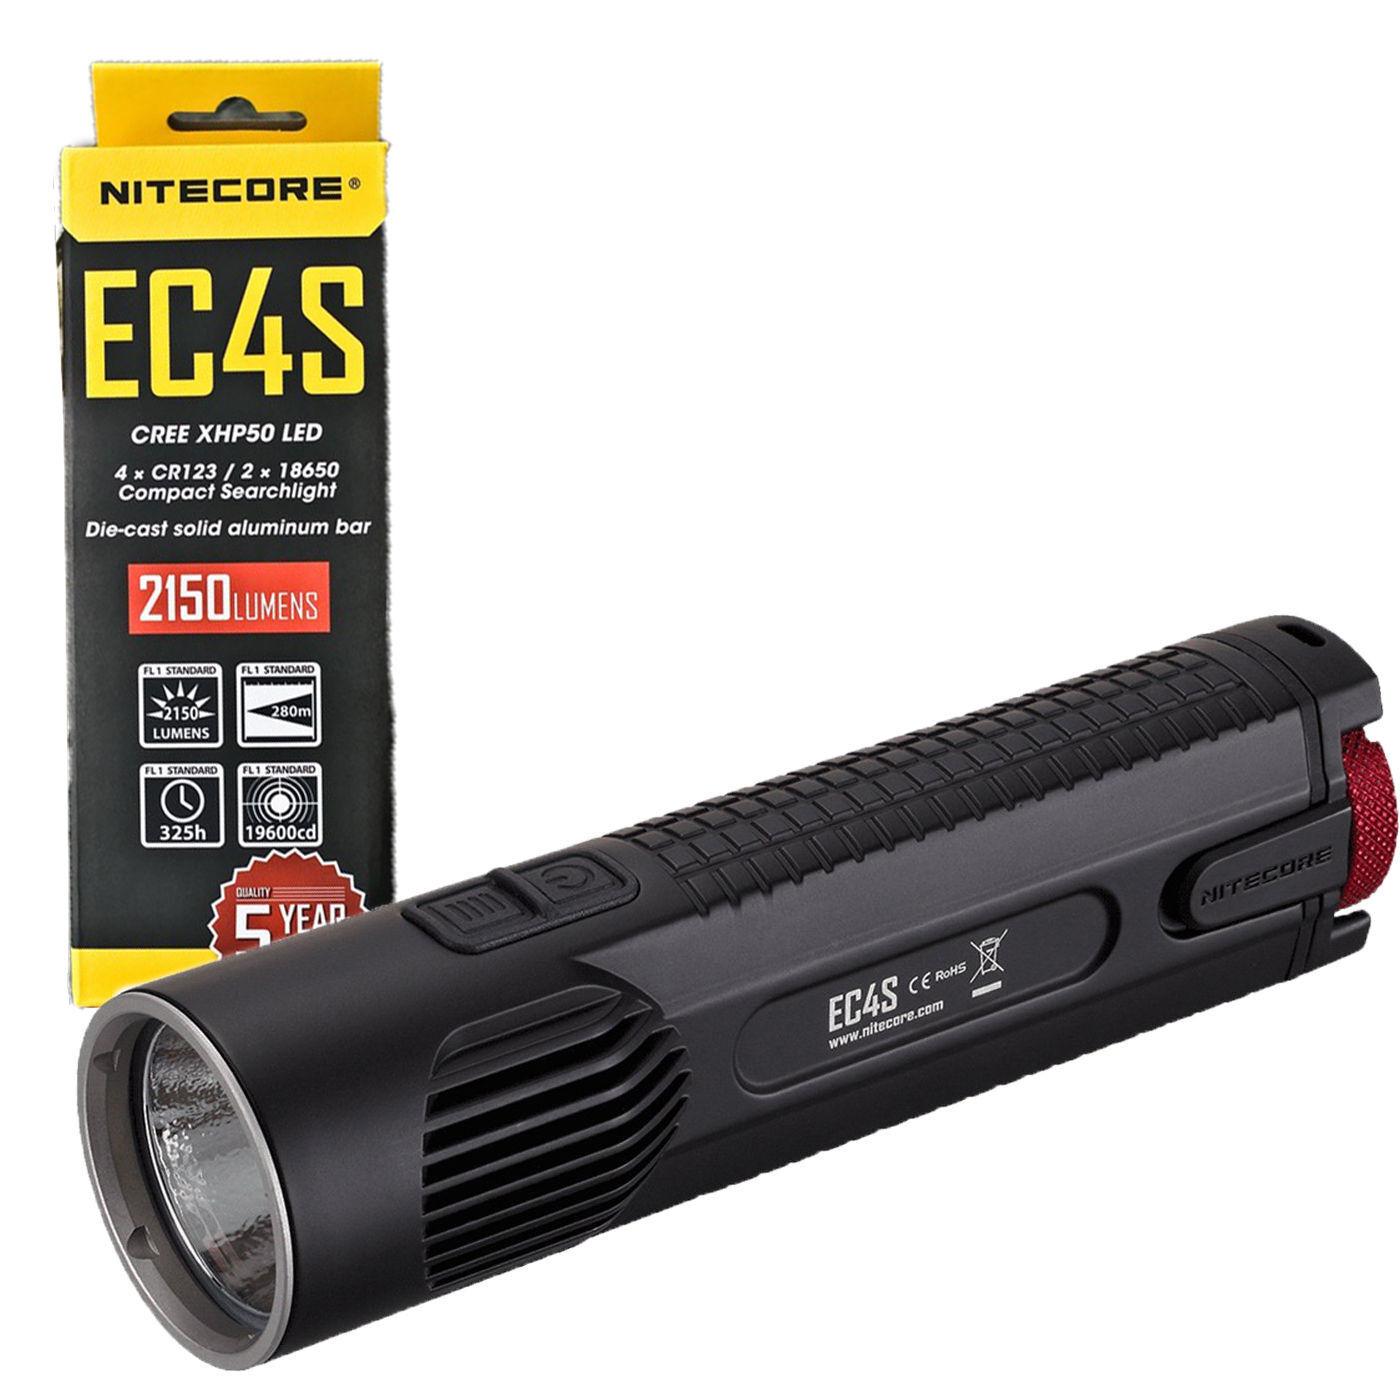 NITECORE EC4S CREE XHP50 LED DieCast Flashlight 2150 Lumens EXPLORER SERIES EC4S